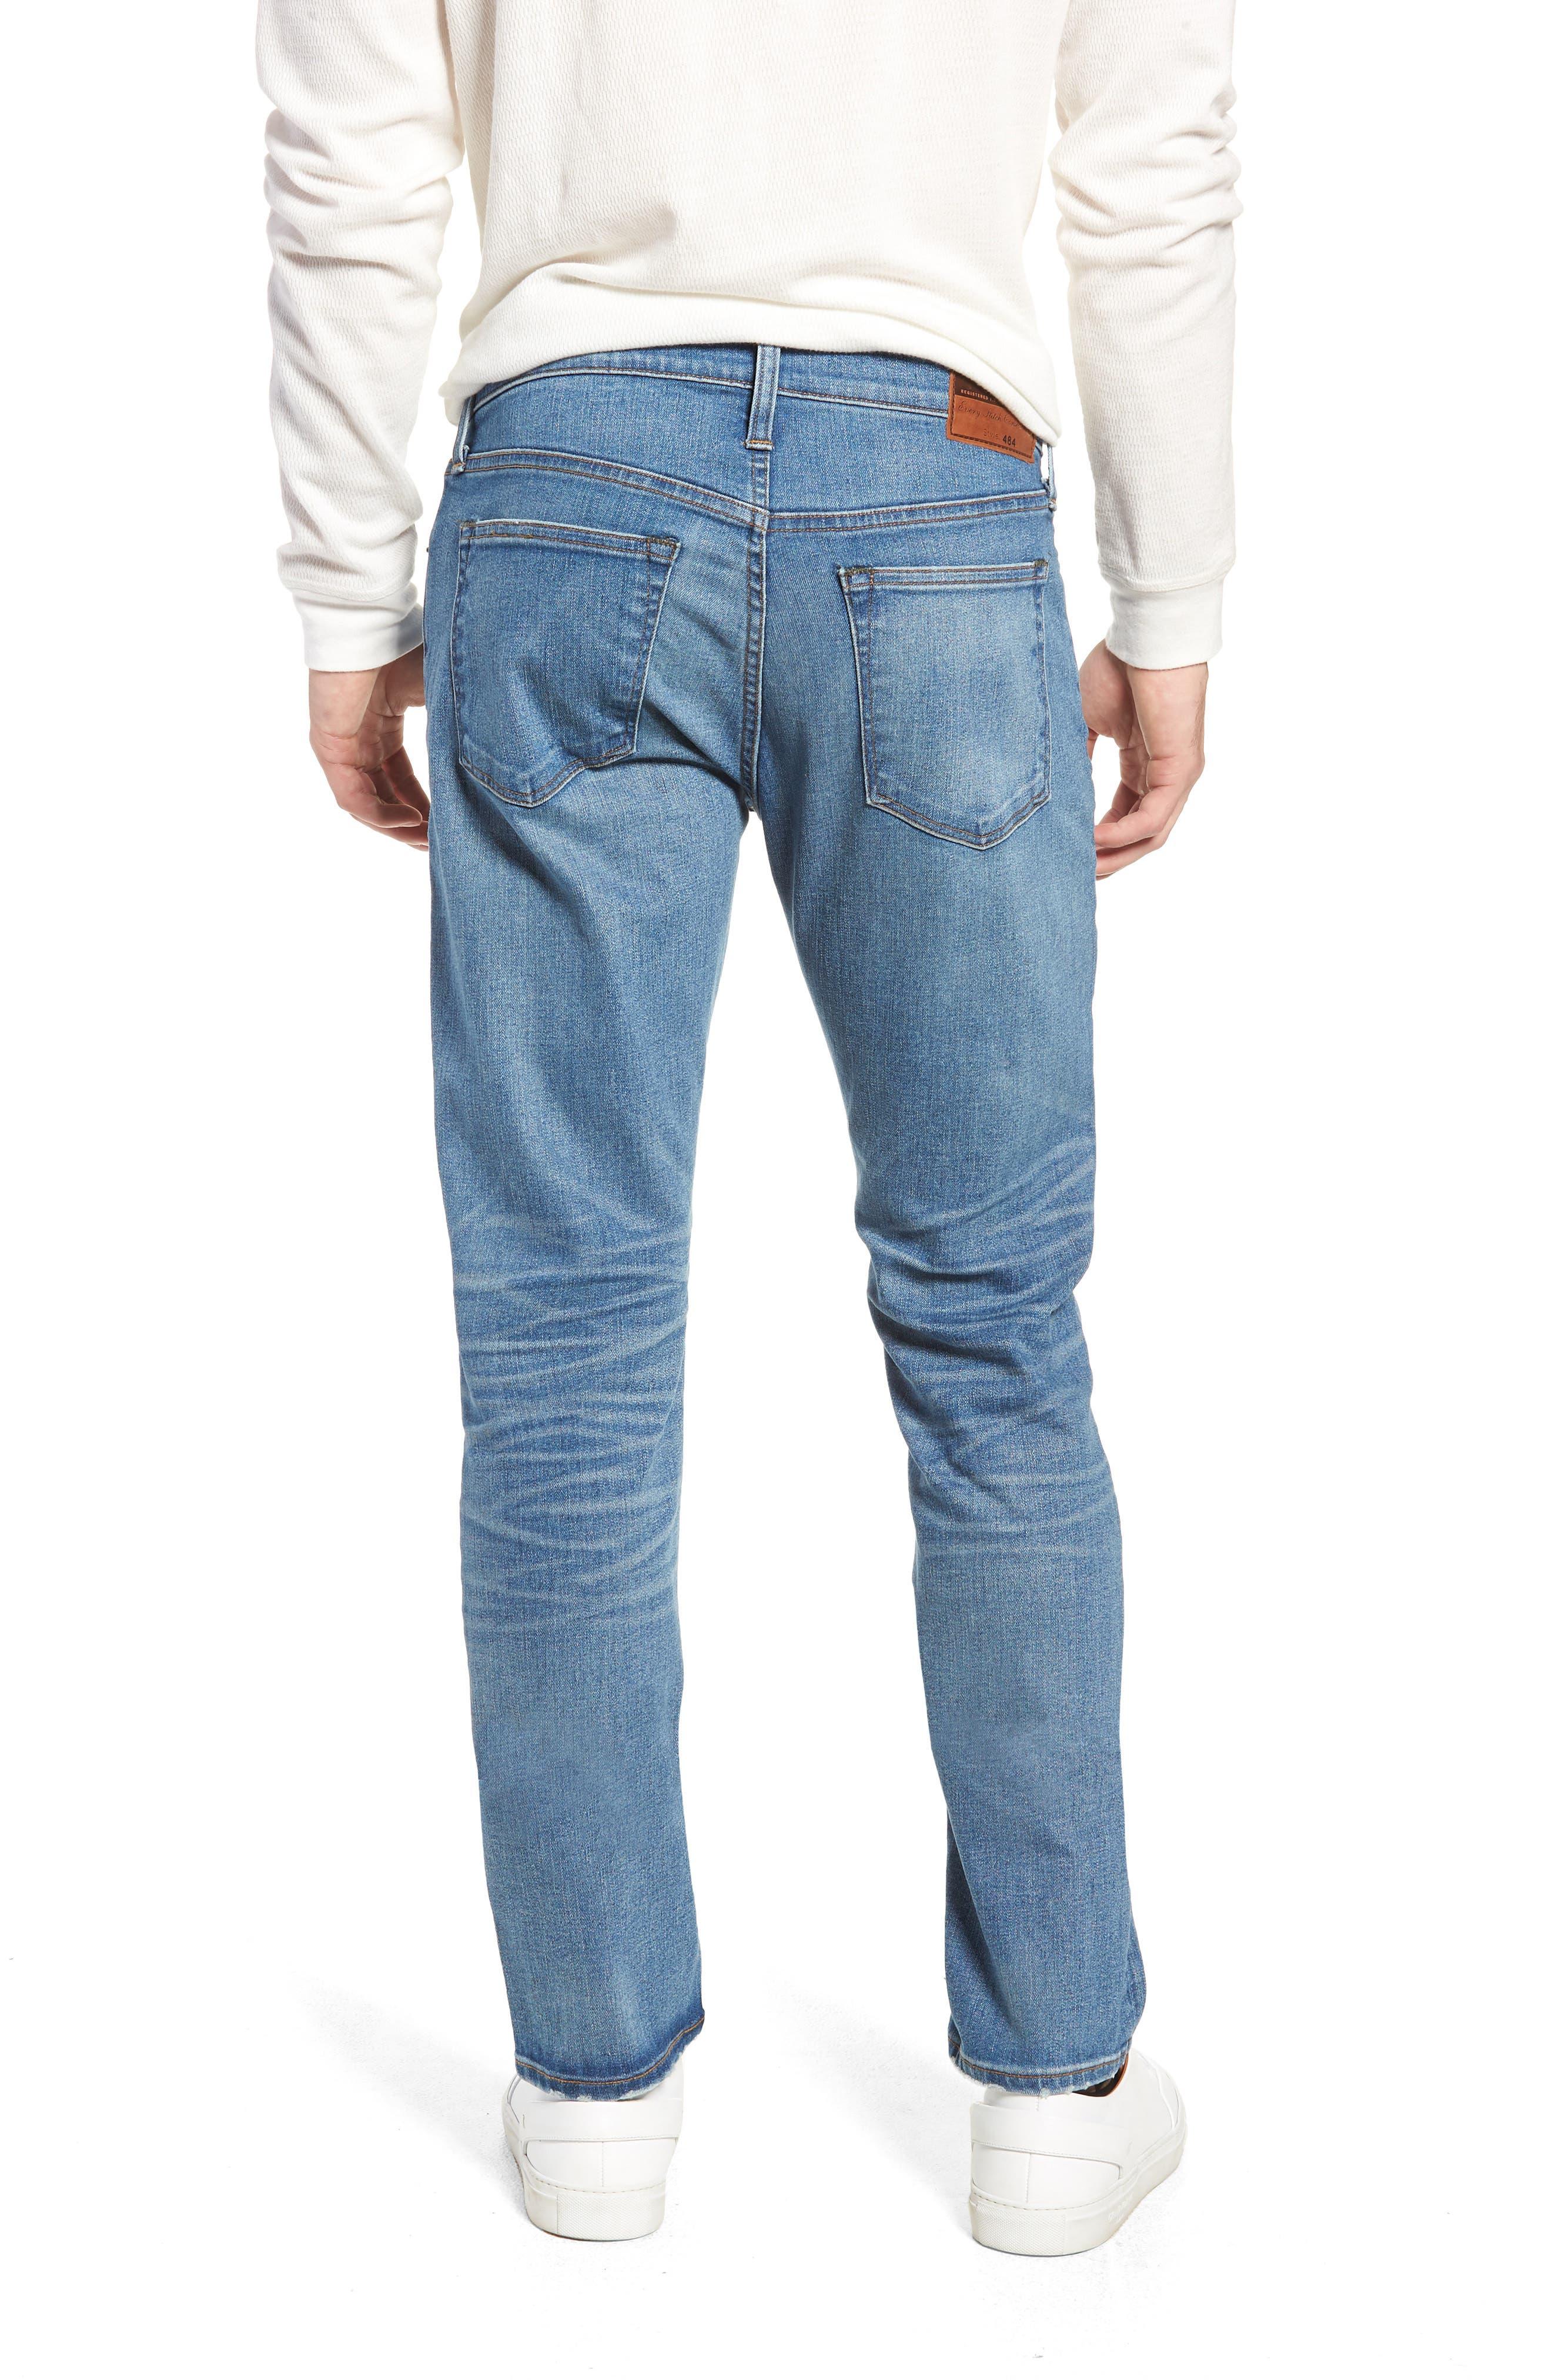 484 Slim Fit Distressed Stretch Jeans,                             Alternate thumbnail 2, color,                             STOCKTON WASH